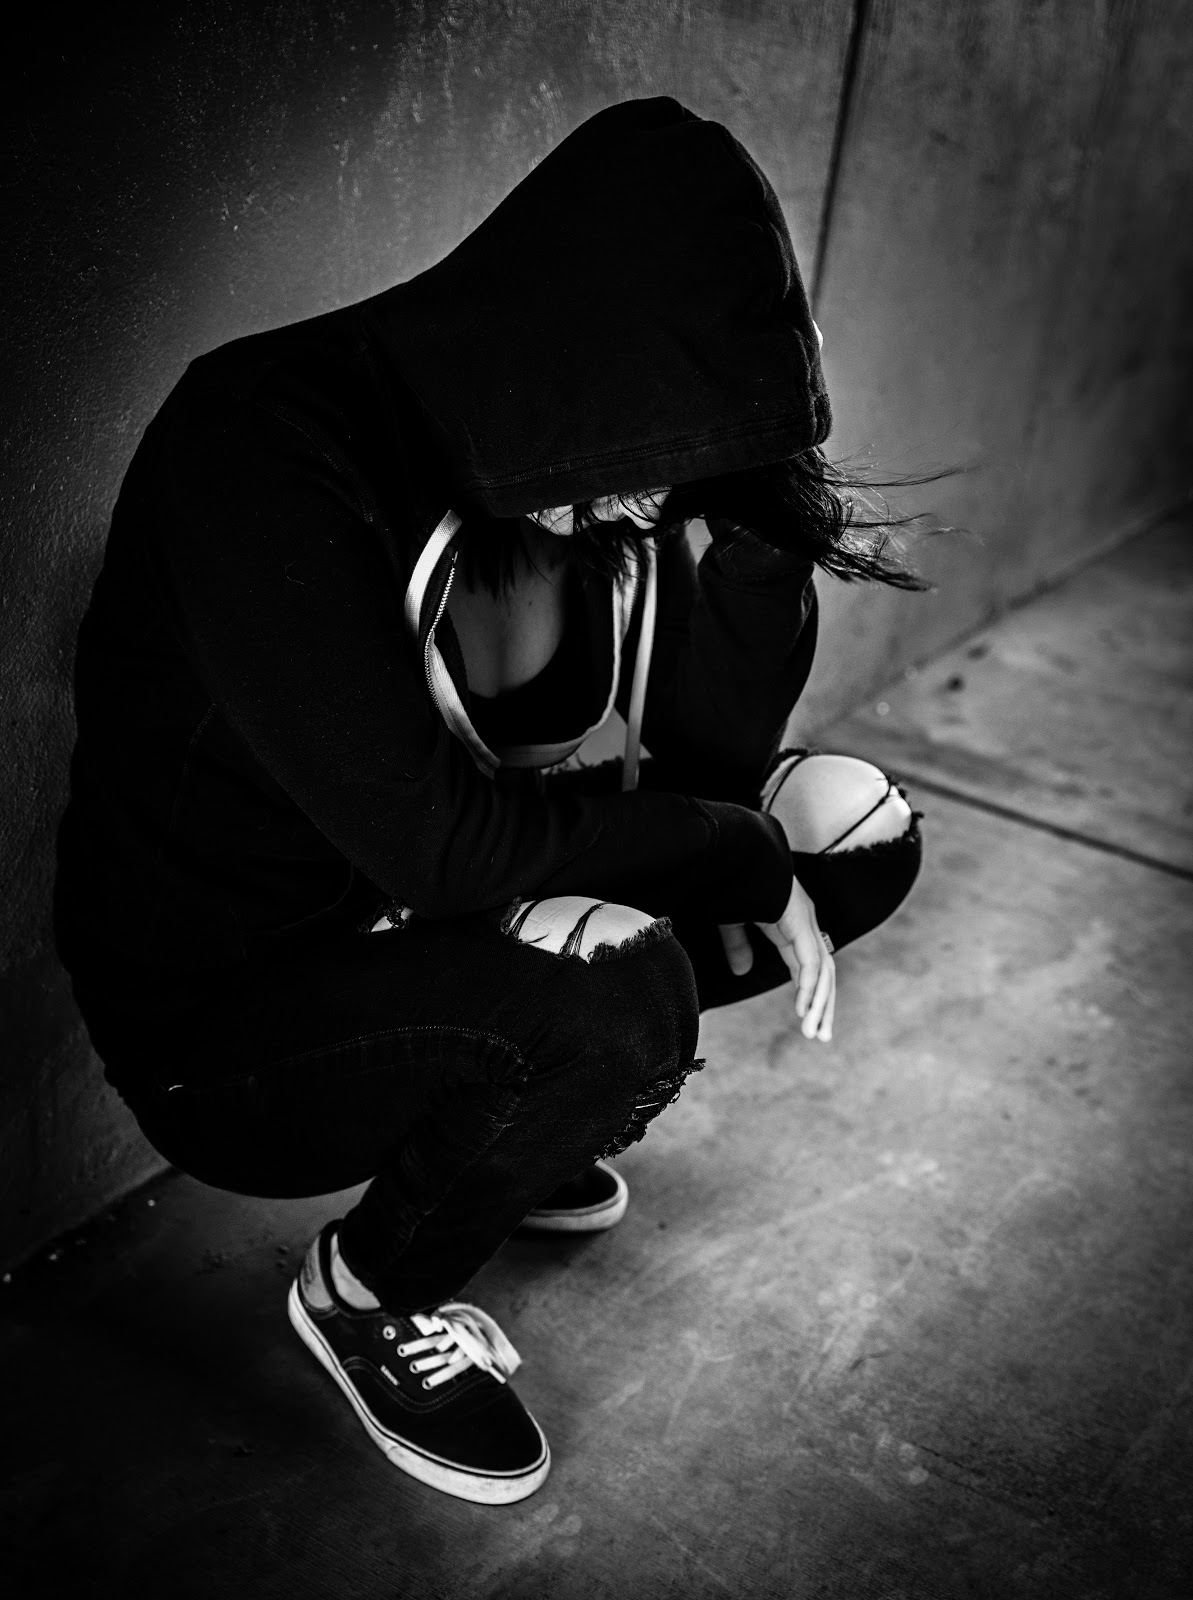 DSM 5 Depression